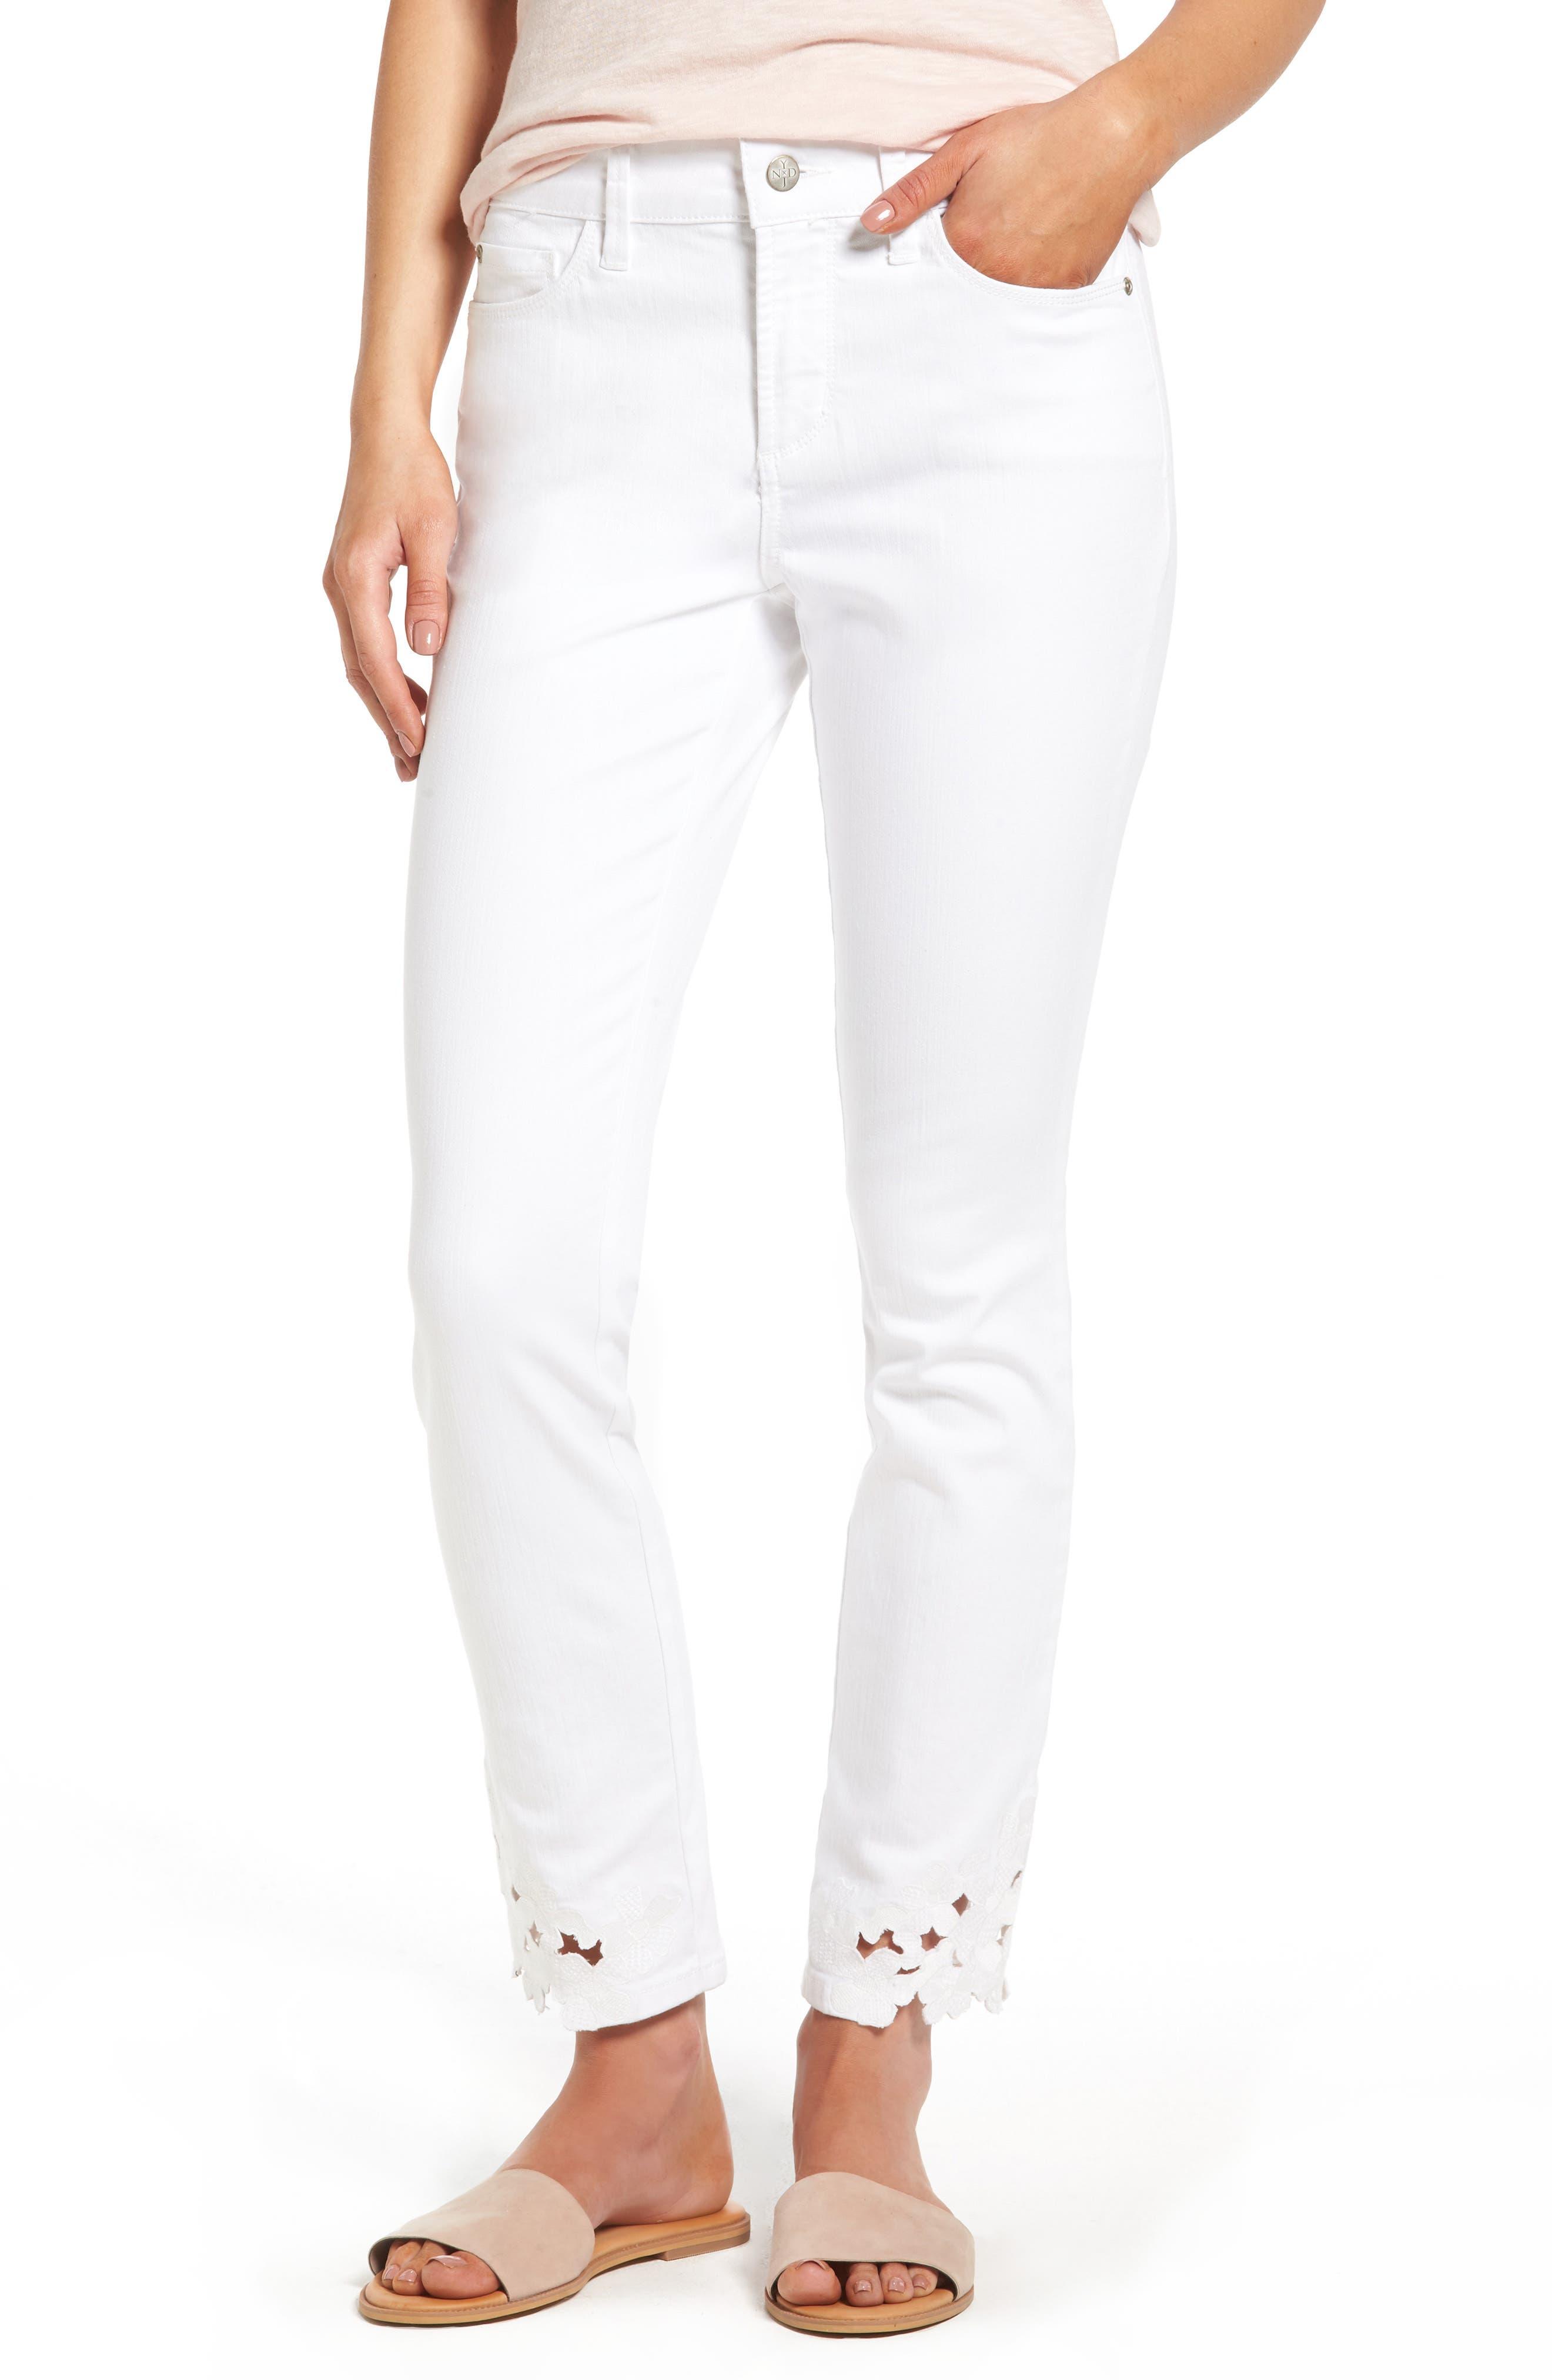 Main Image - NYDJ Alina Eyelet Hem Stretch Skinny Jeans (Optic White) (Regular & Petite)